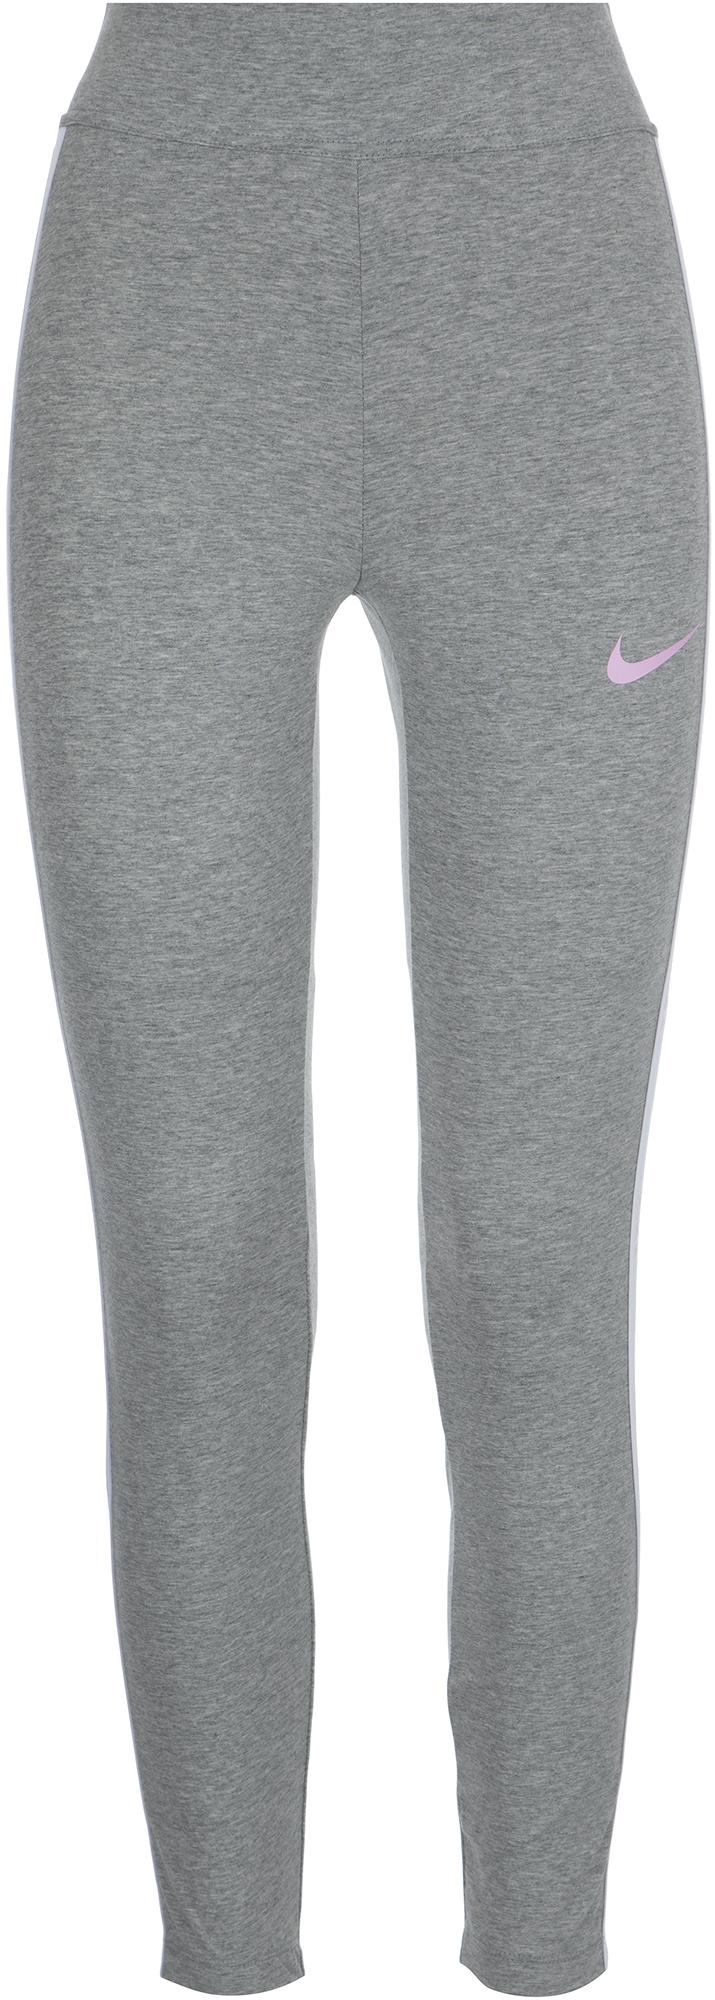 Nike Легинсы женские Nike Sportswear, размер 46-48 nike бриджи женские nike sportswear vintage размер 48 50